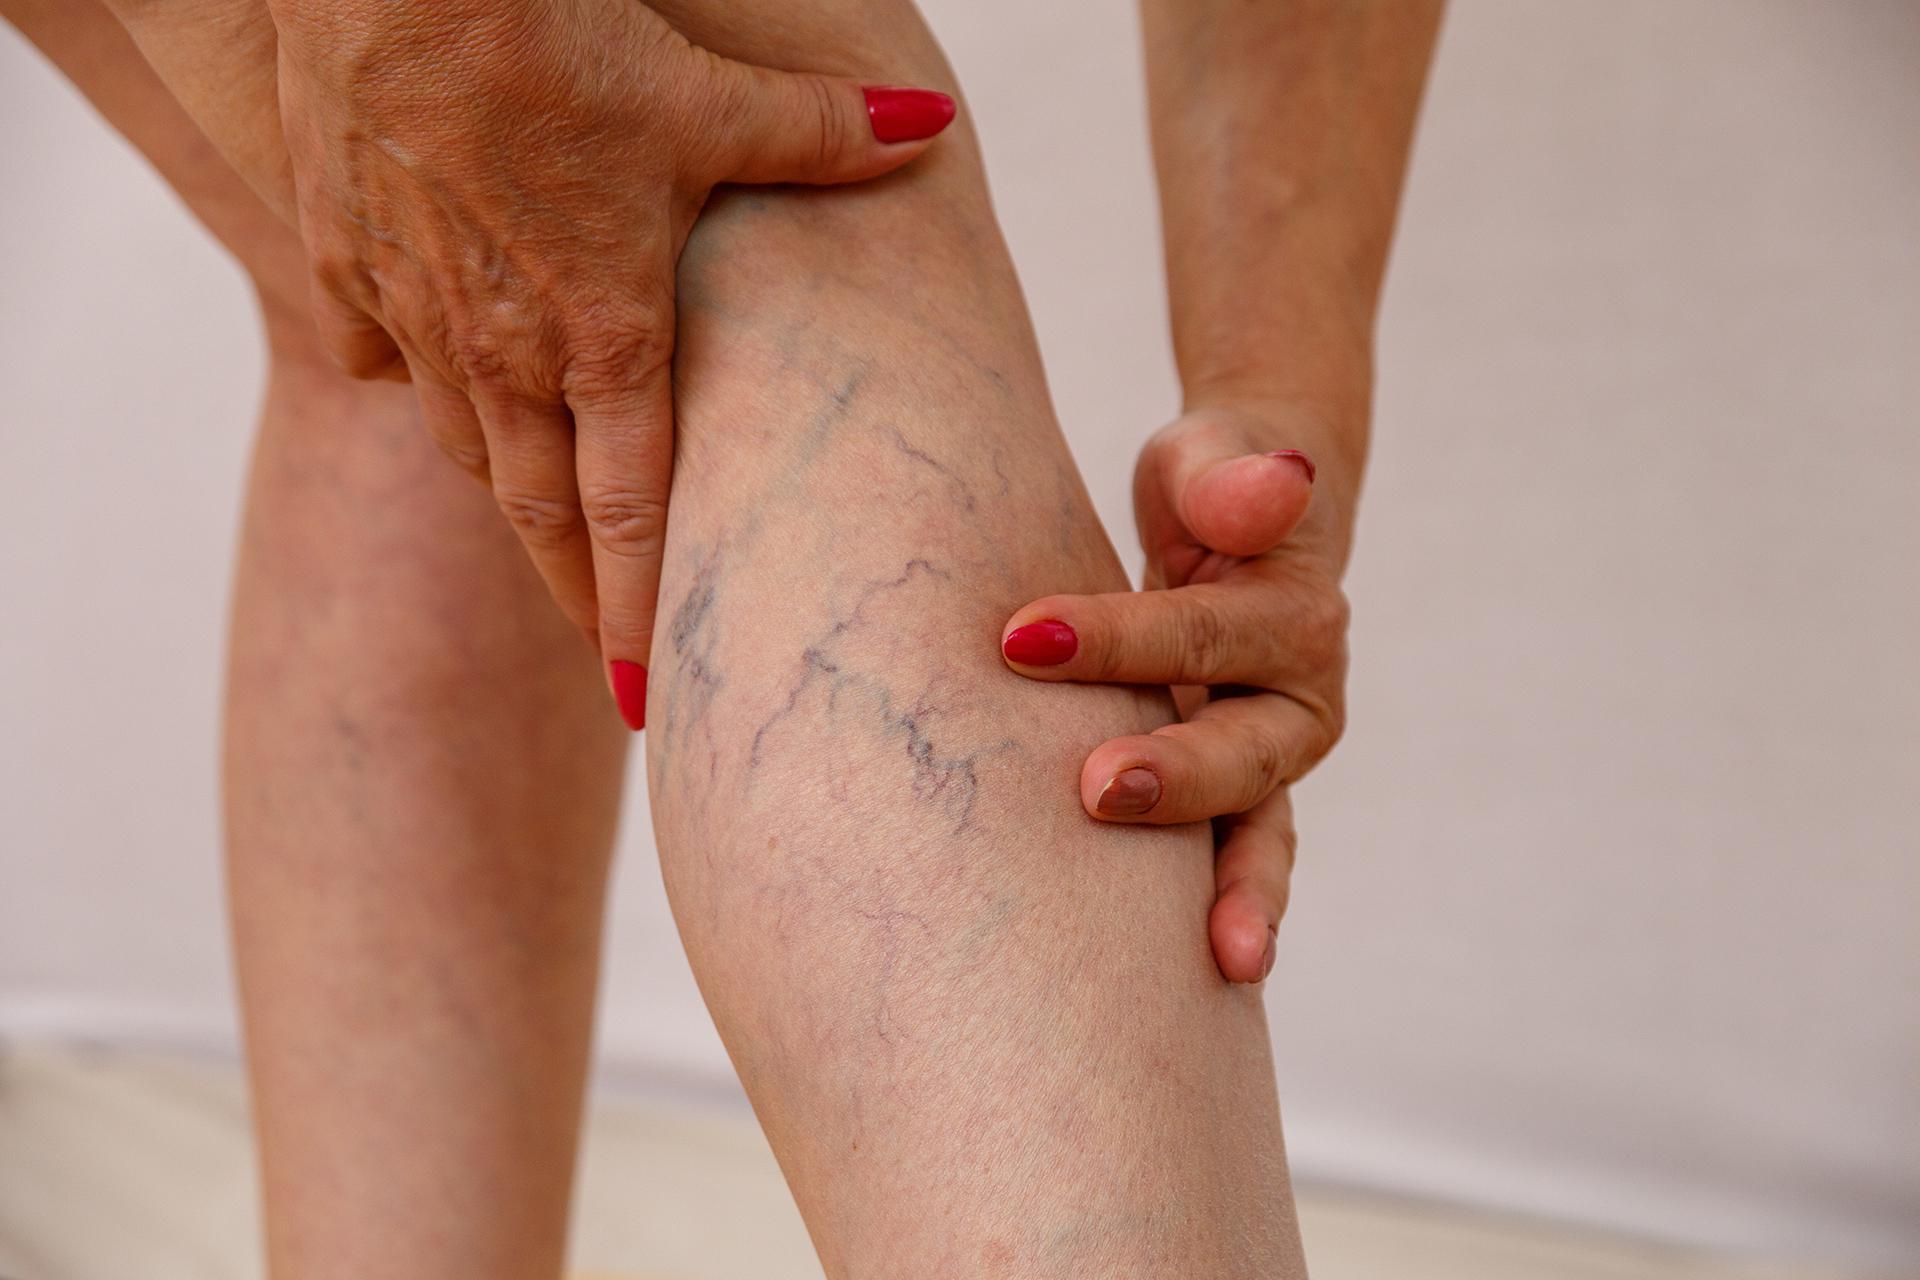 vascular-issues-requiring-leg-pain-doctor-Pico-Rivera